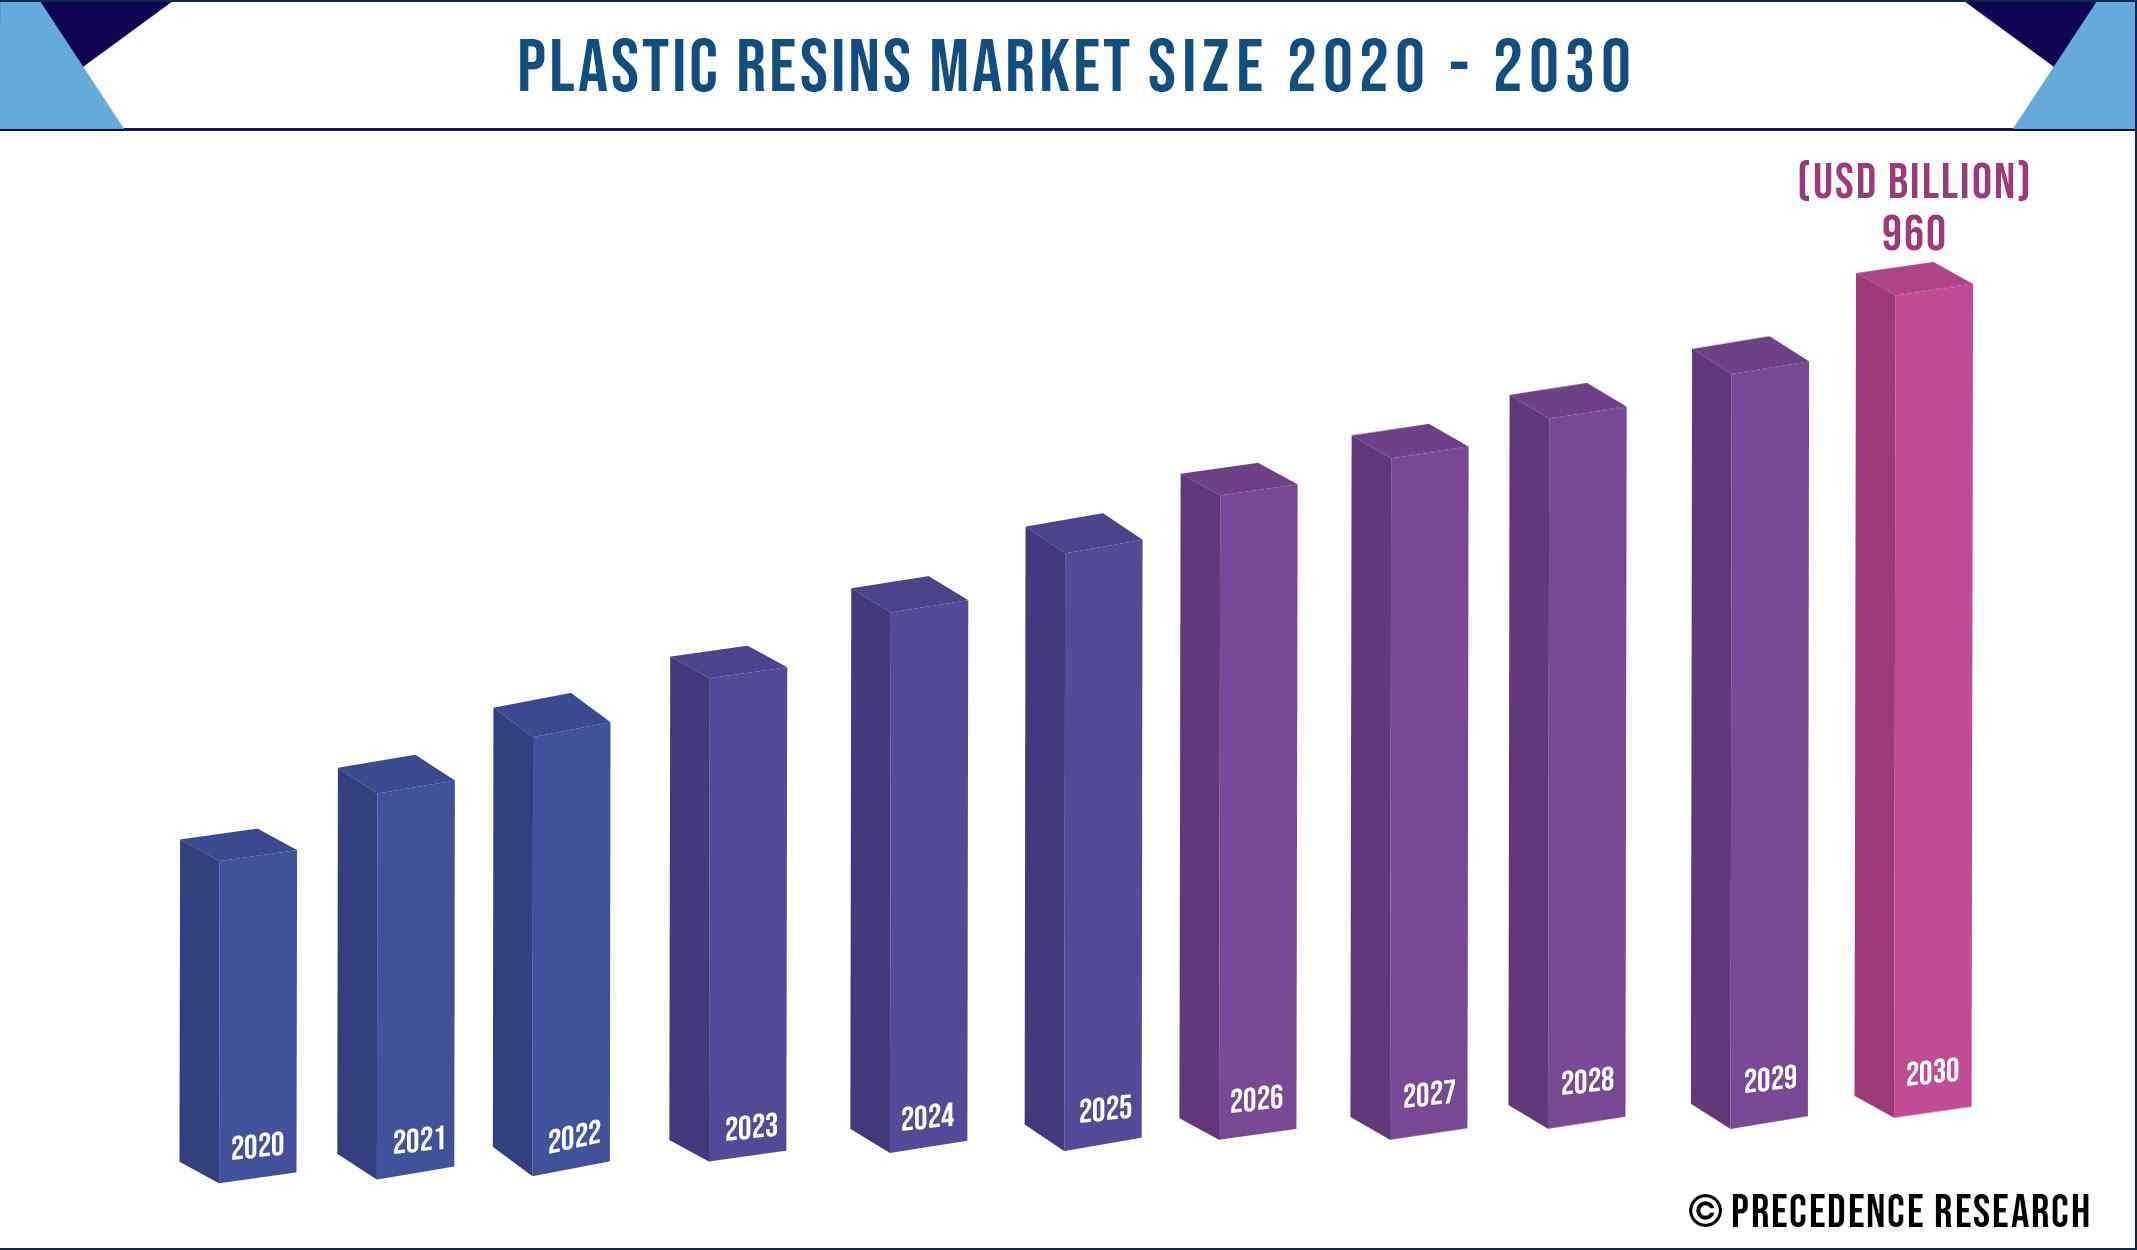 Plastic Resins Market Size 2020-2030